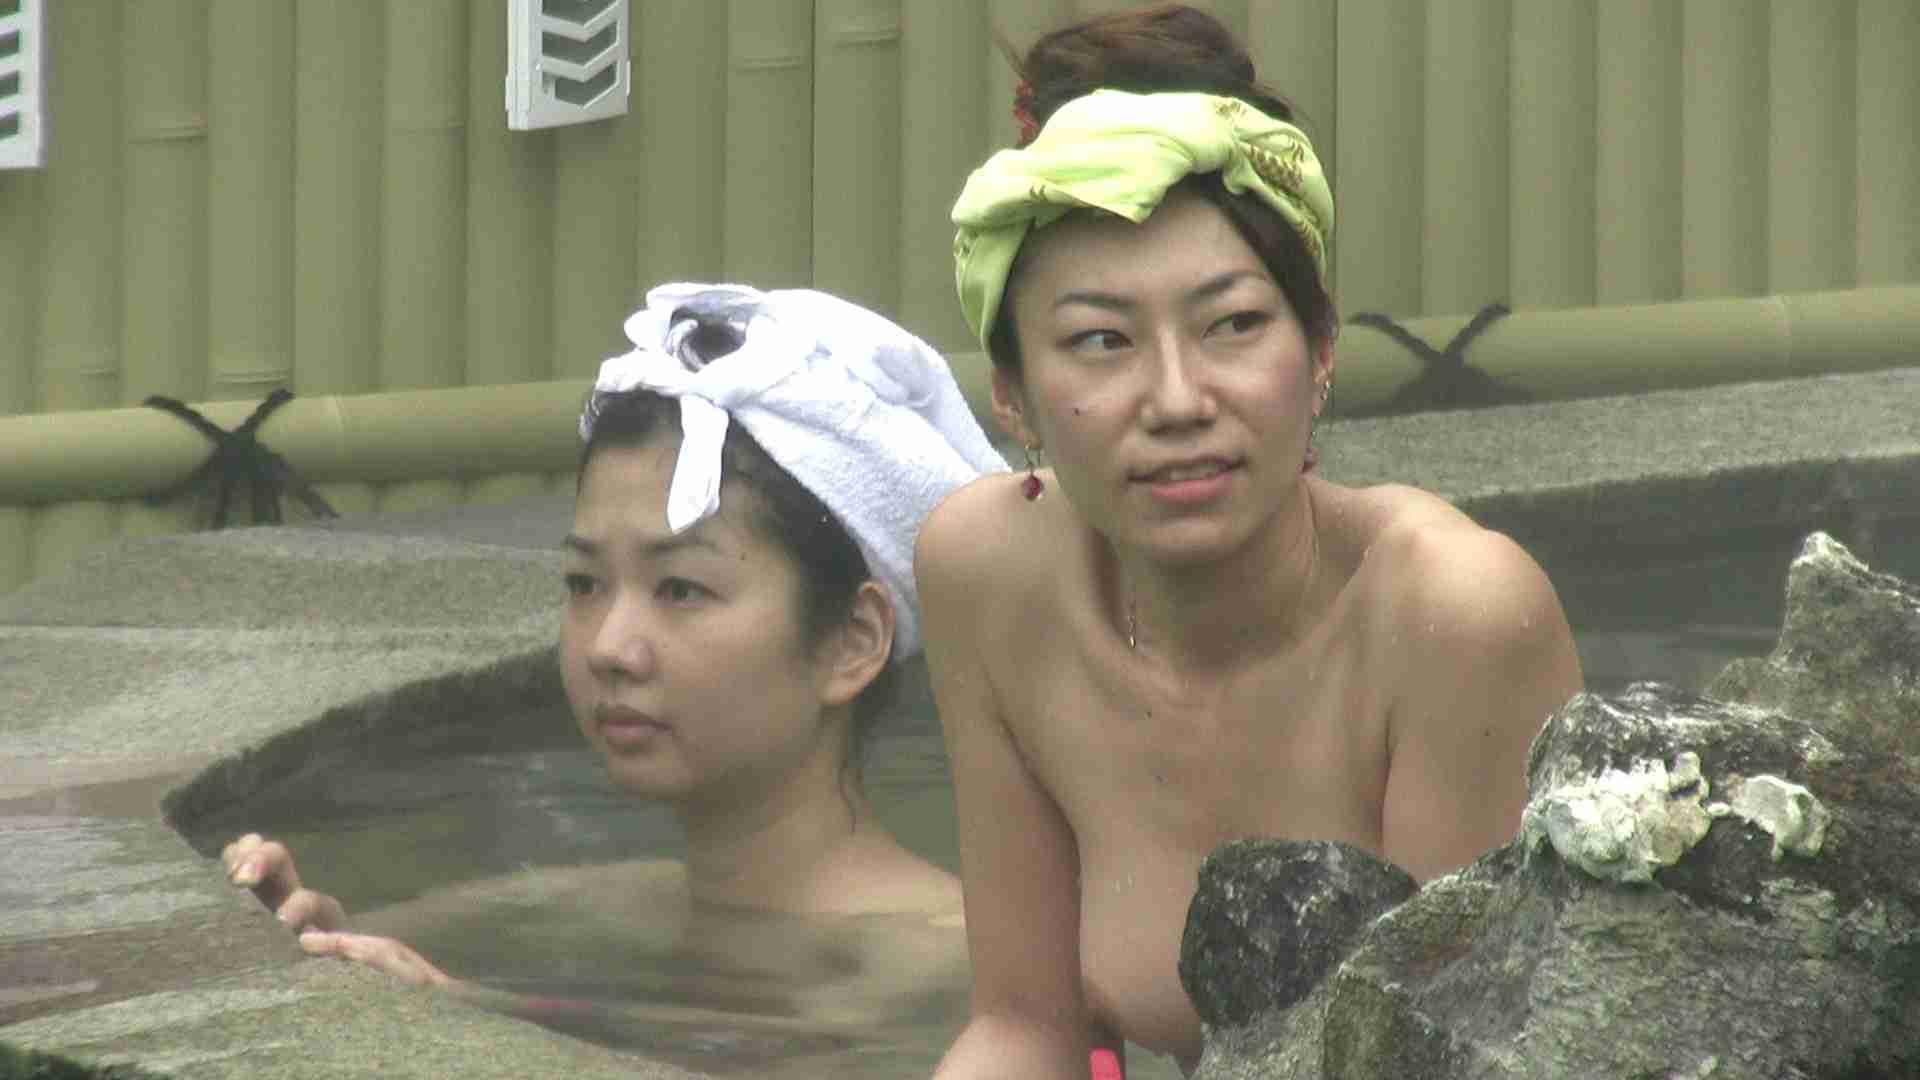 Aquaな露天風呂Vol.192 盗撮 ワレメ動画紹介 79連発 2